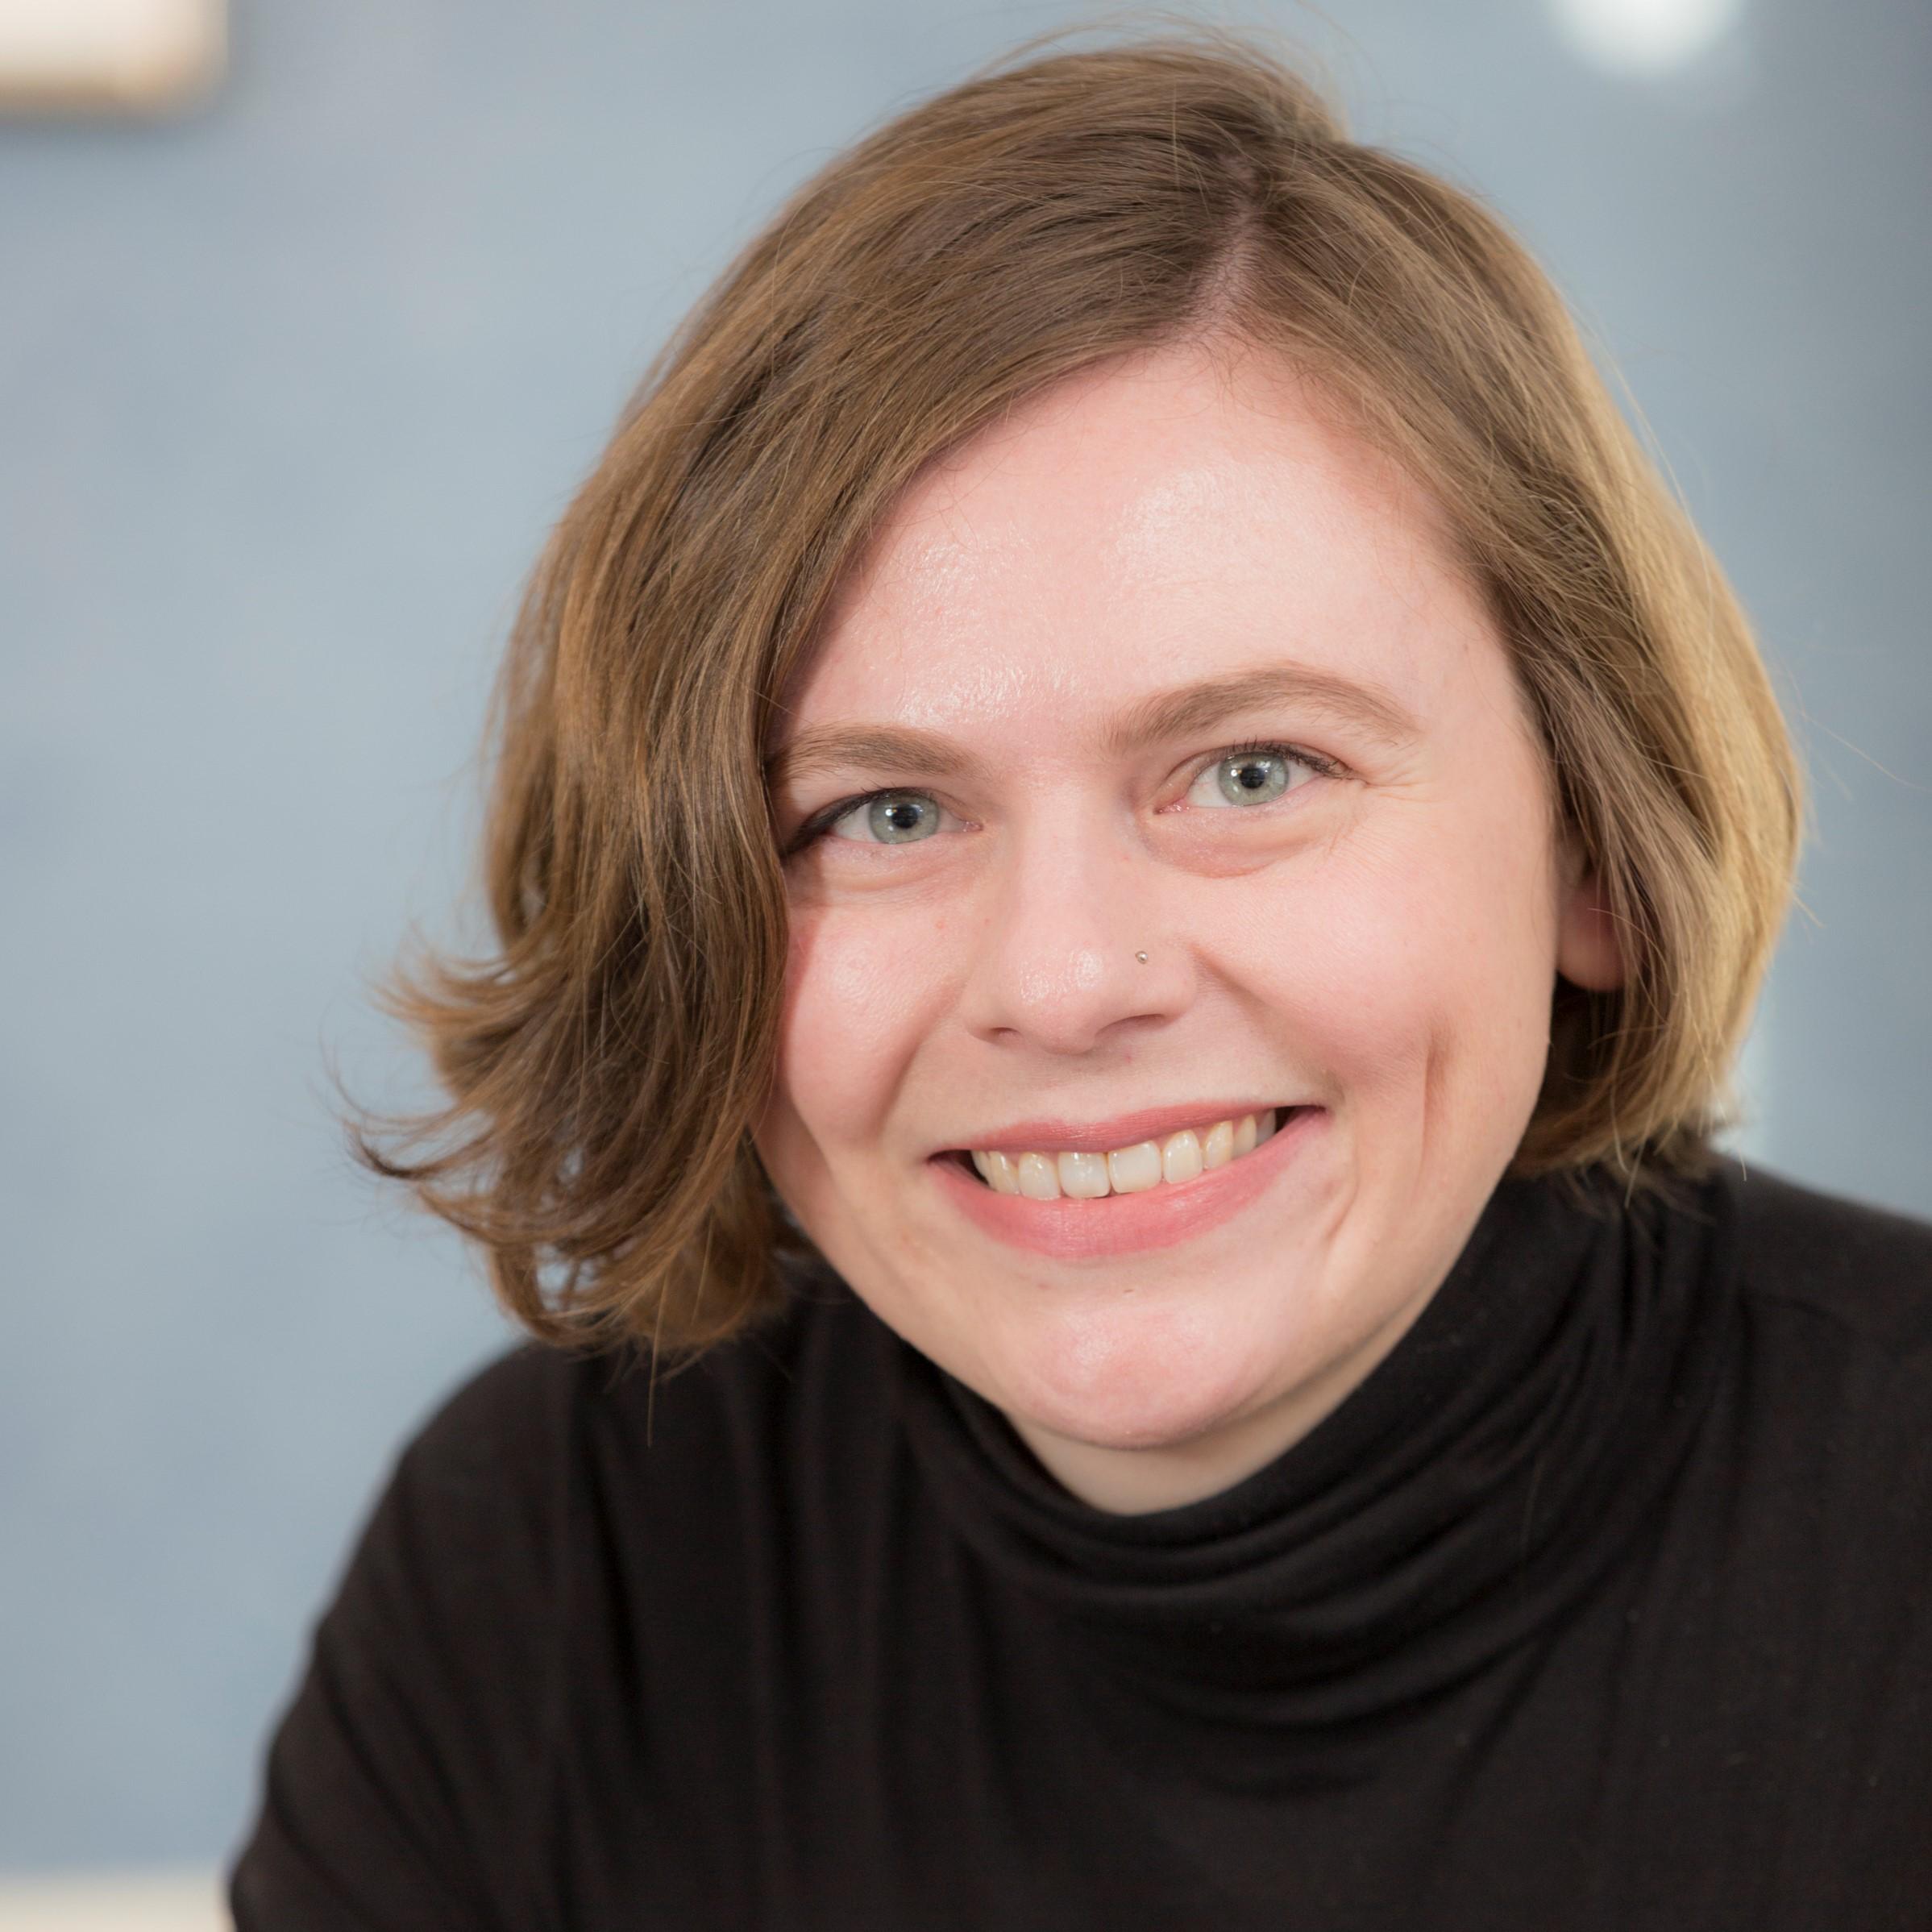 Rachel Reinke